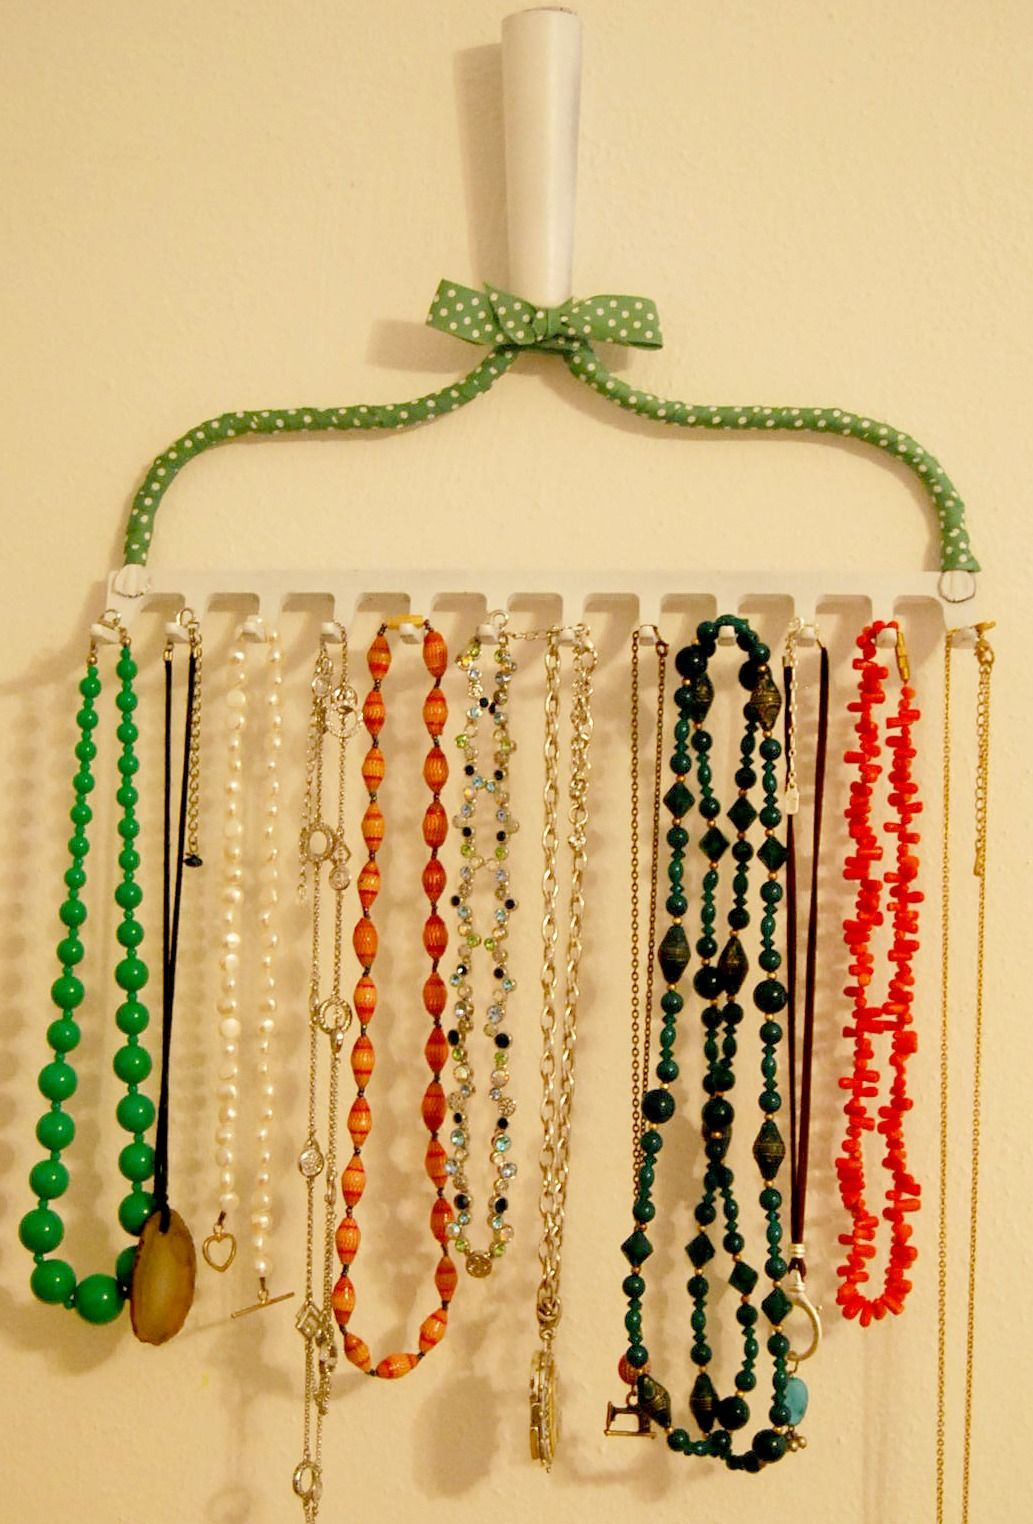 Recycled Rake Necklace Hanger Organizer Jewellery Storage